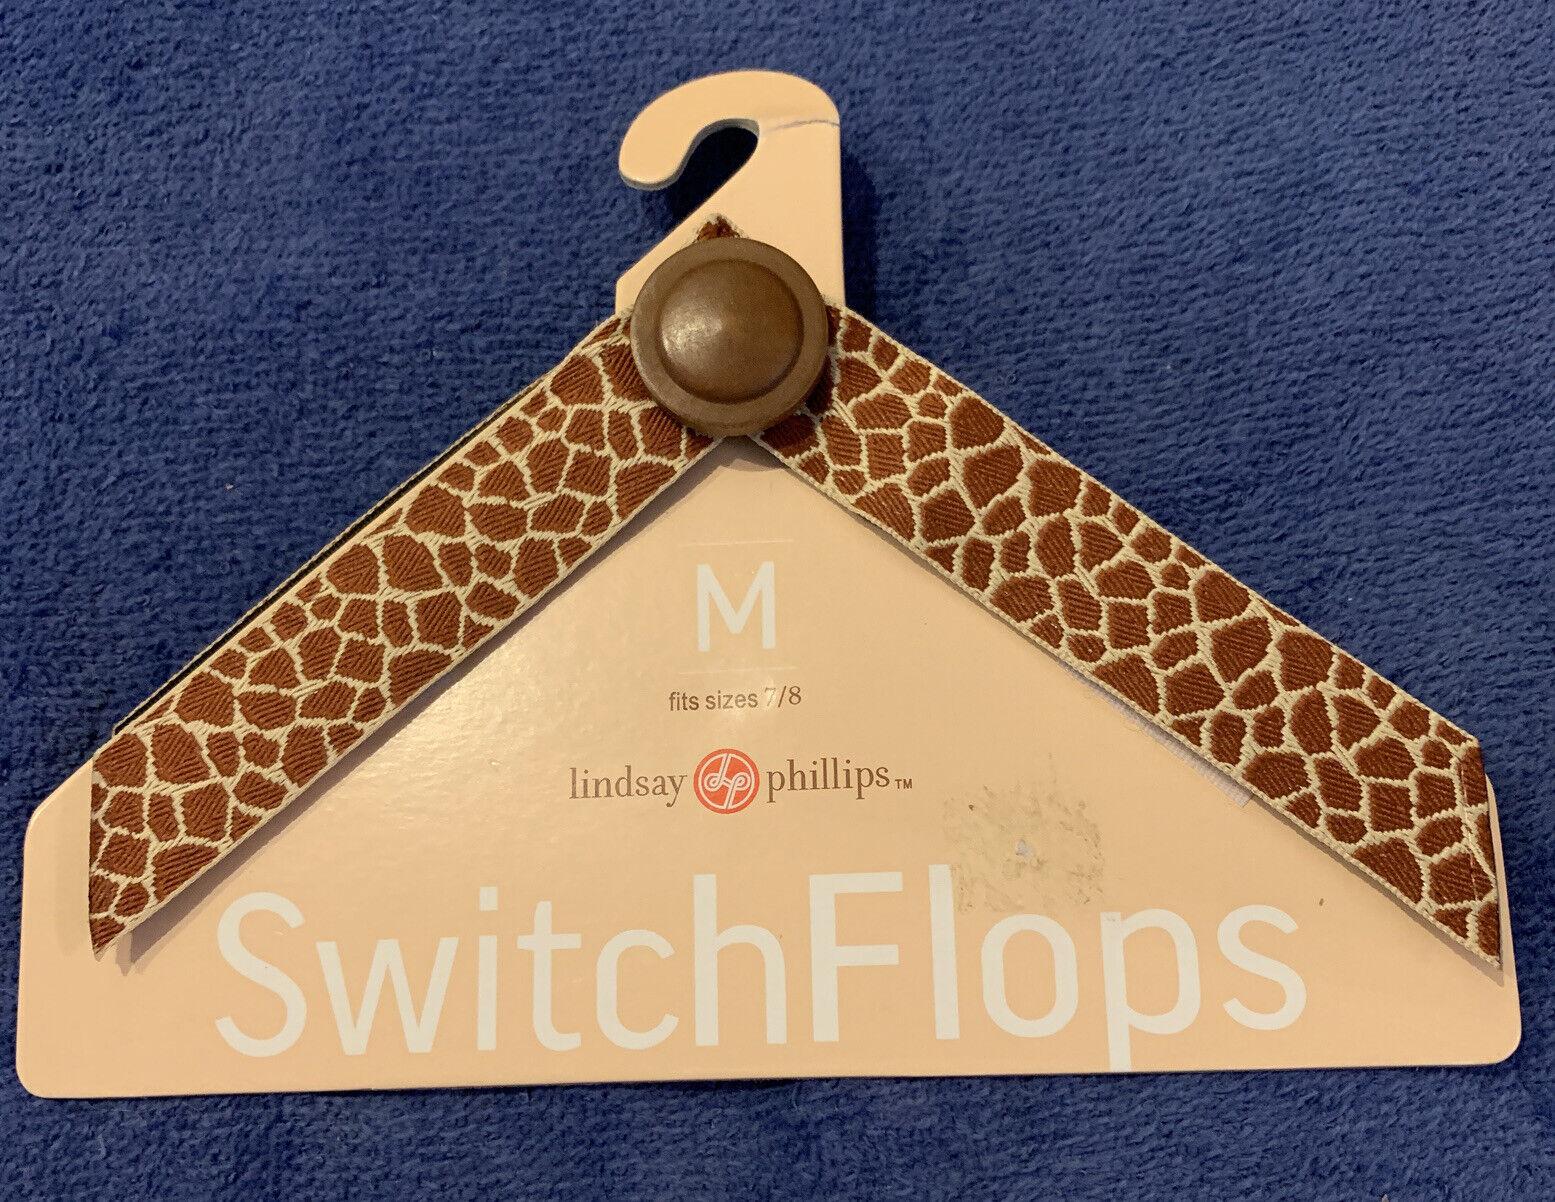 Lindsay Phillips Switchflops Straps, Style Sheila, Size Medium 7/8